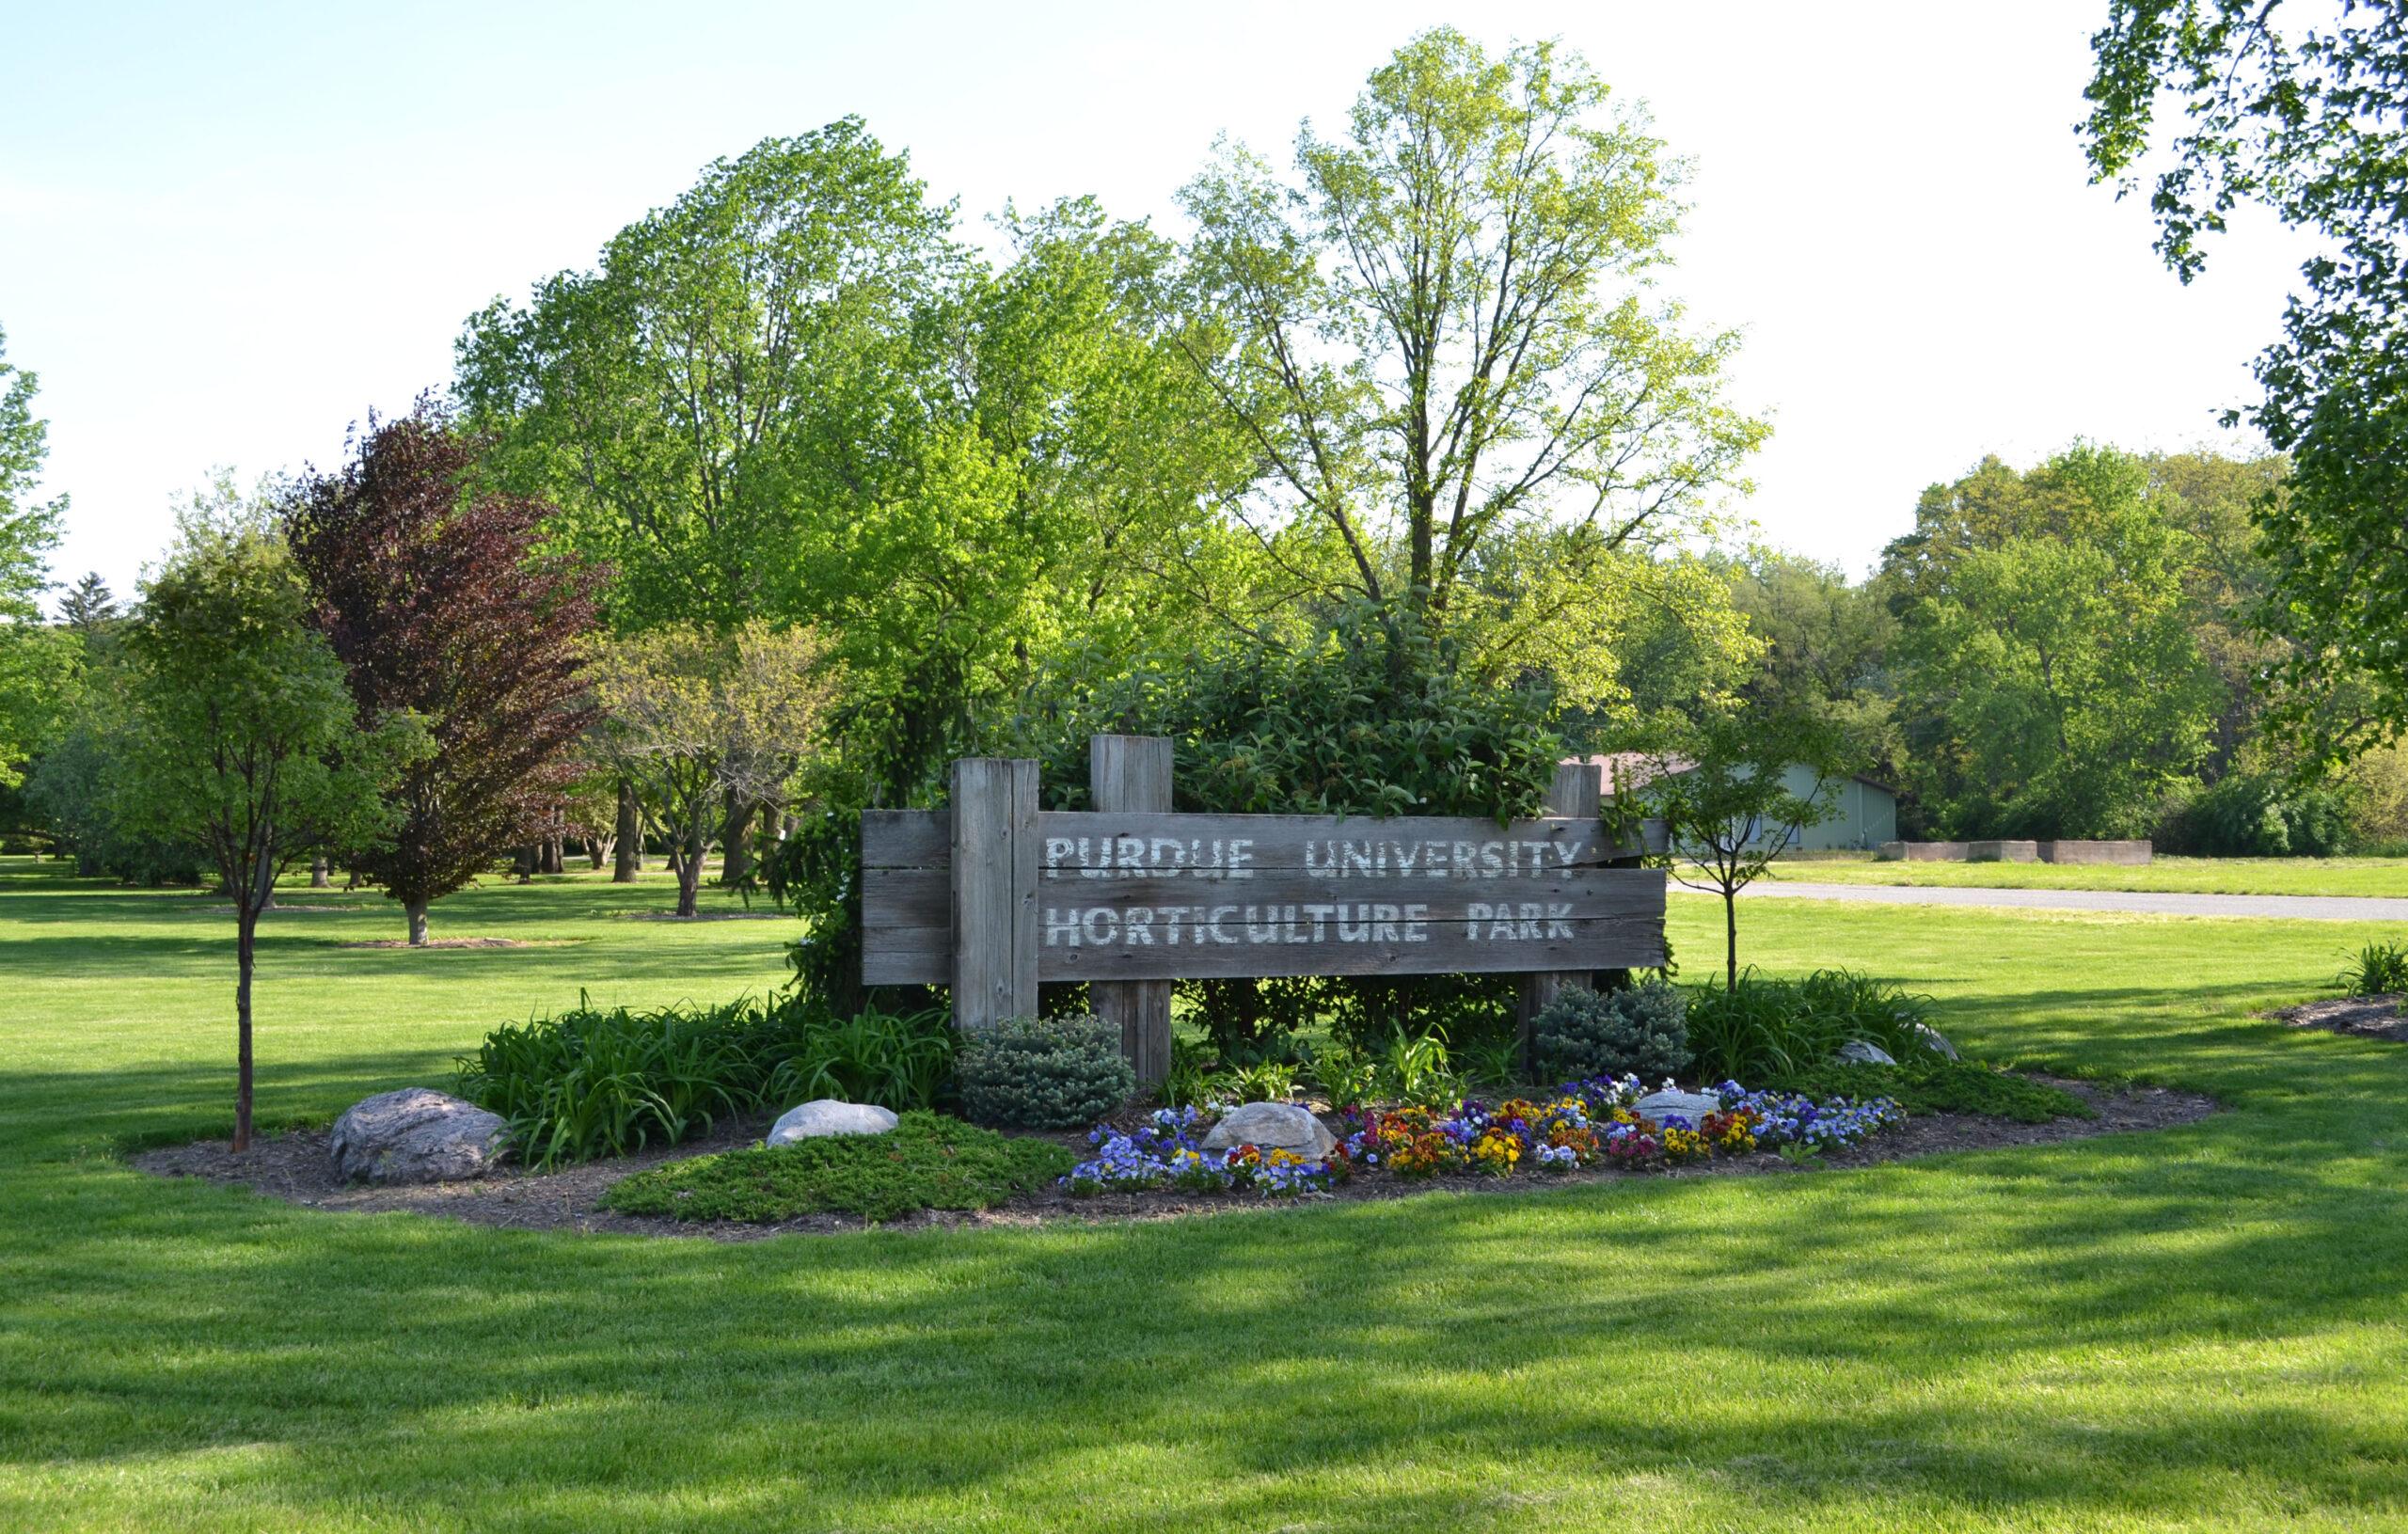 Horticulture Park Entrance Sign on West State Street